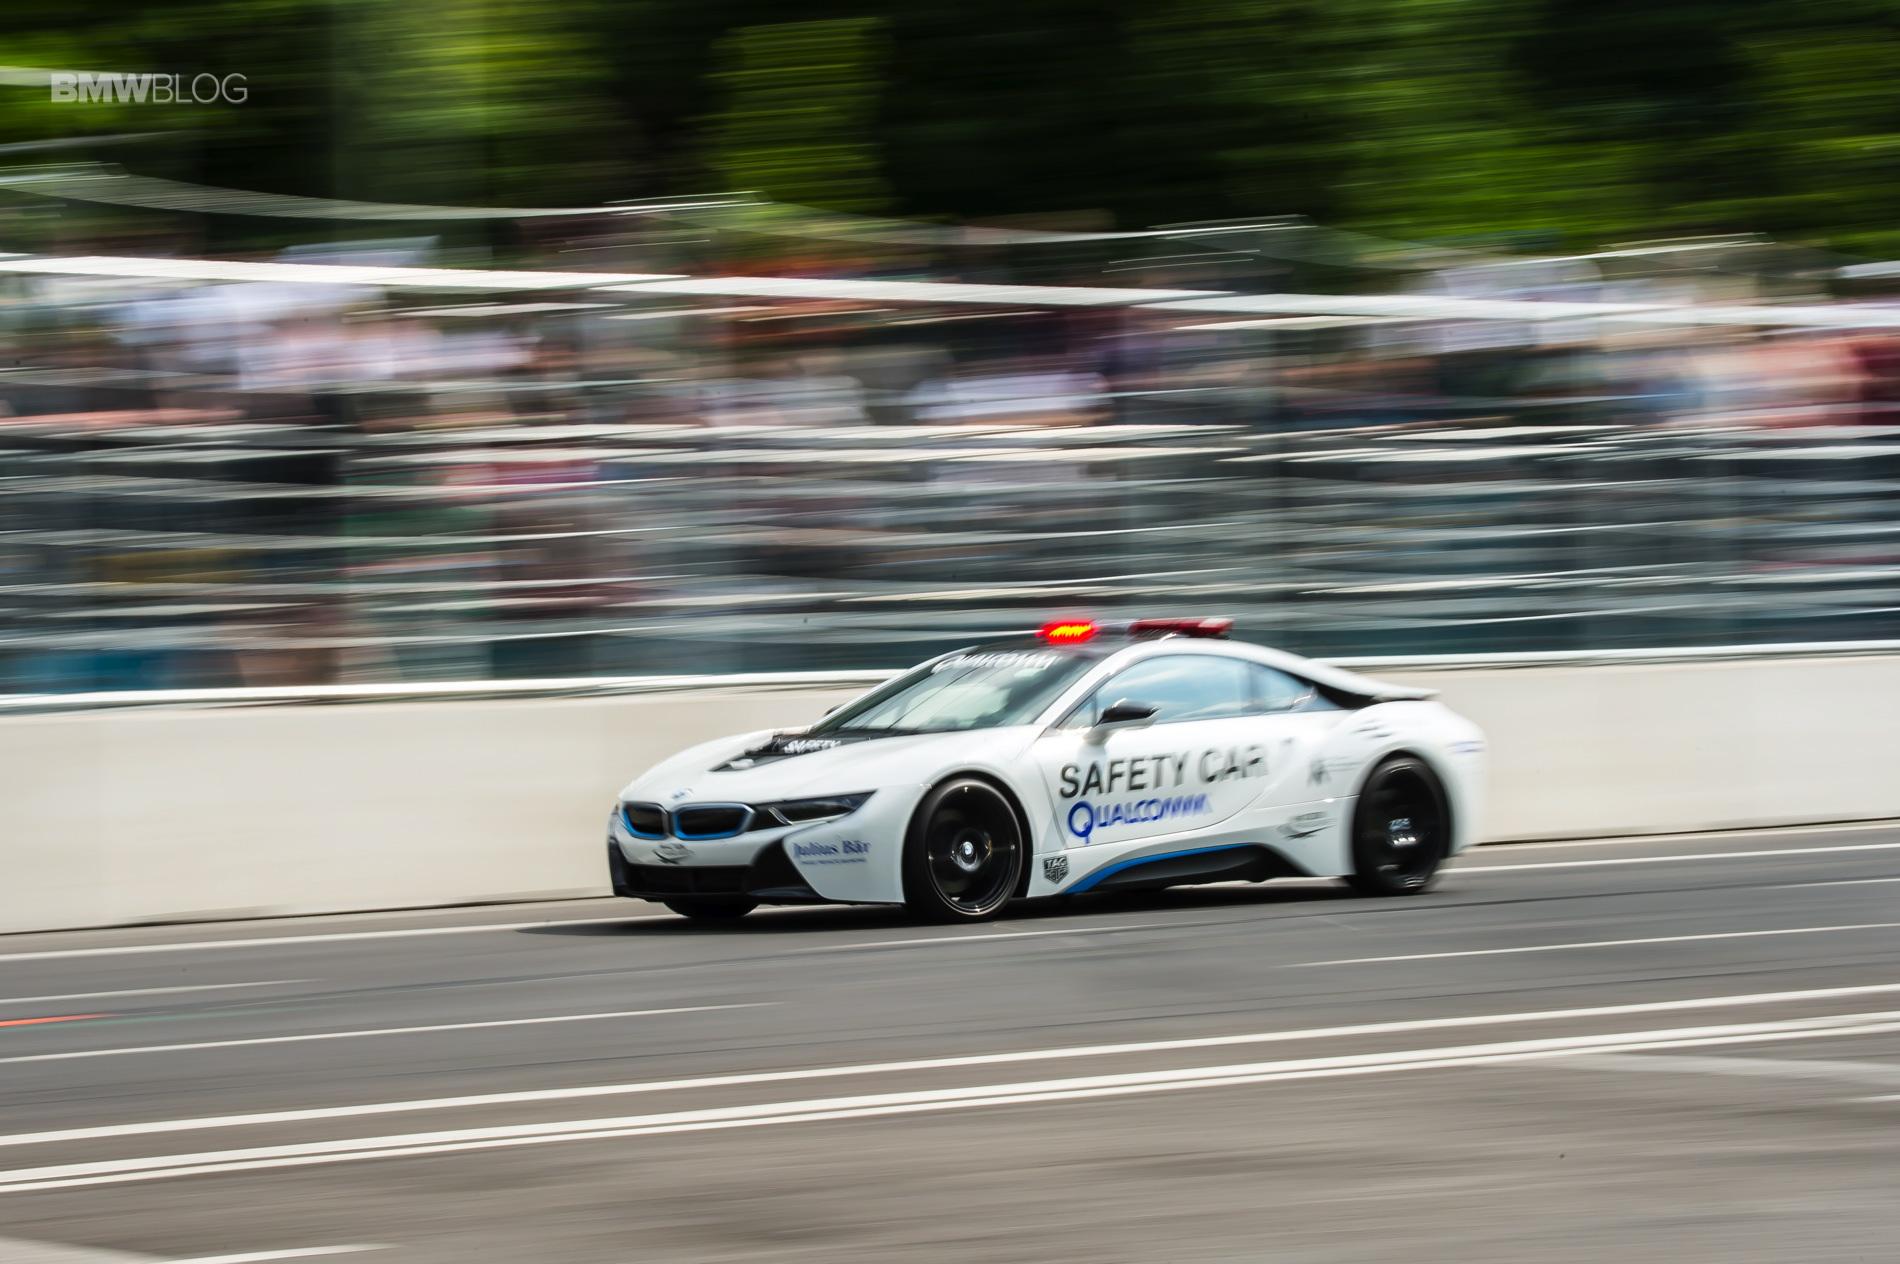 BMW i8 Safety Car test drive 85